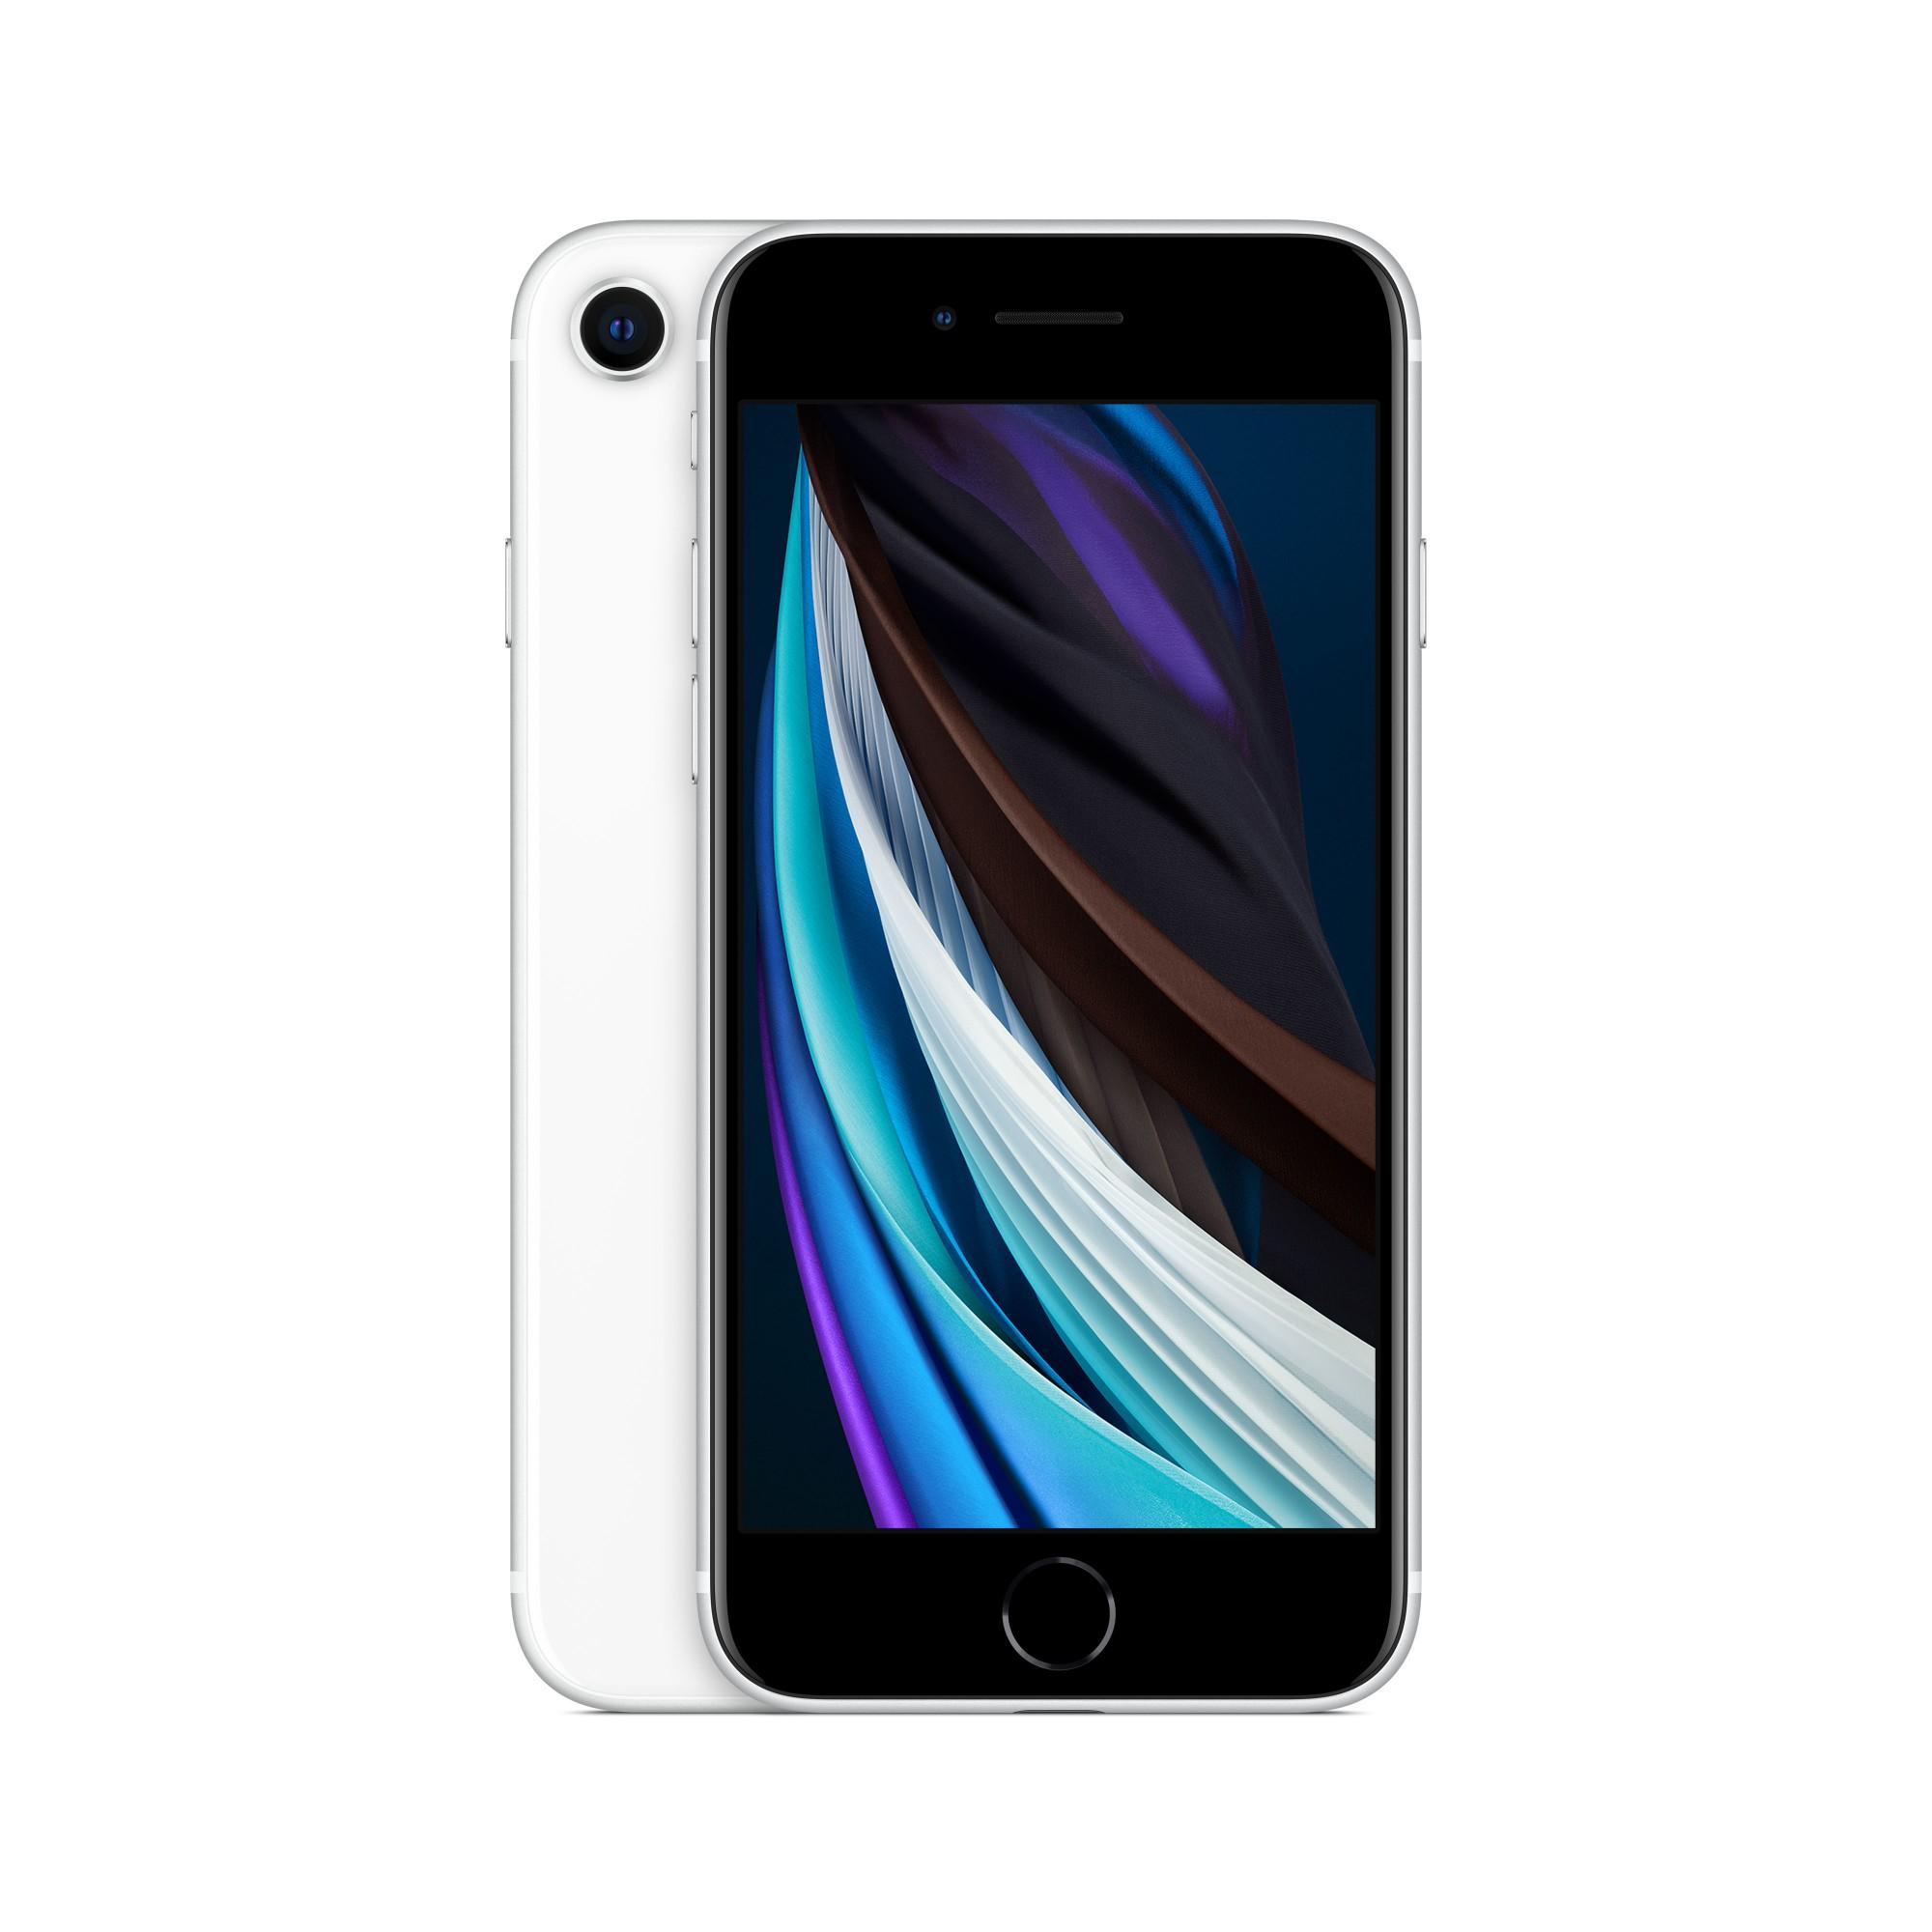 "Apple iPhone SE 11,9 cm (4.7"") 128 GB Ranura híbrida Dual SIM 4G Blanco iOS 13"